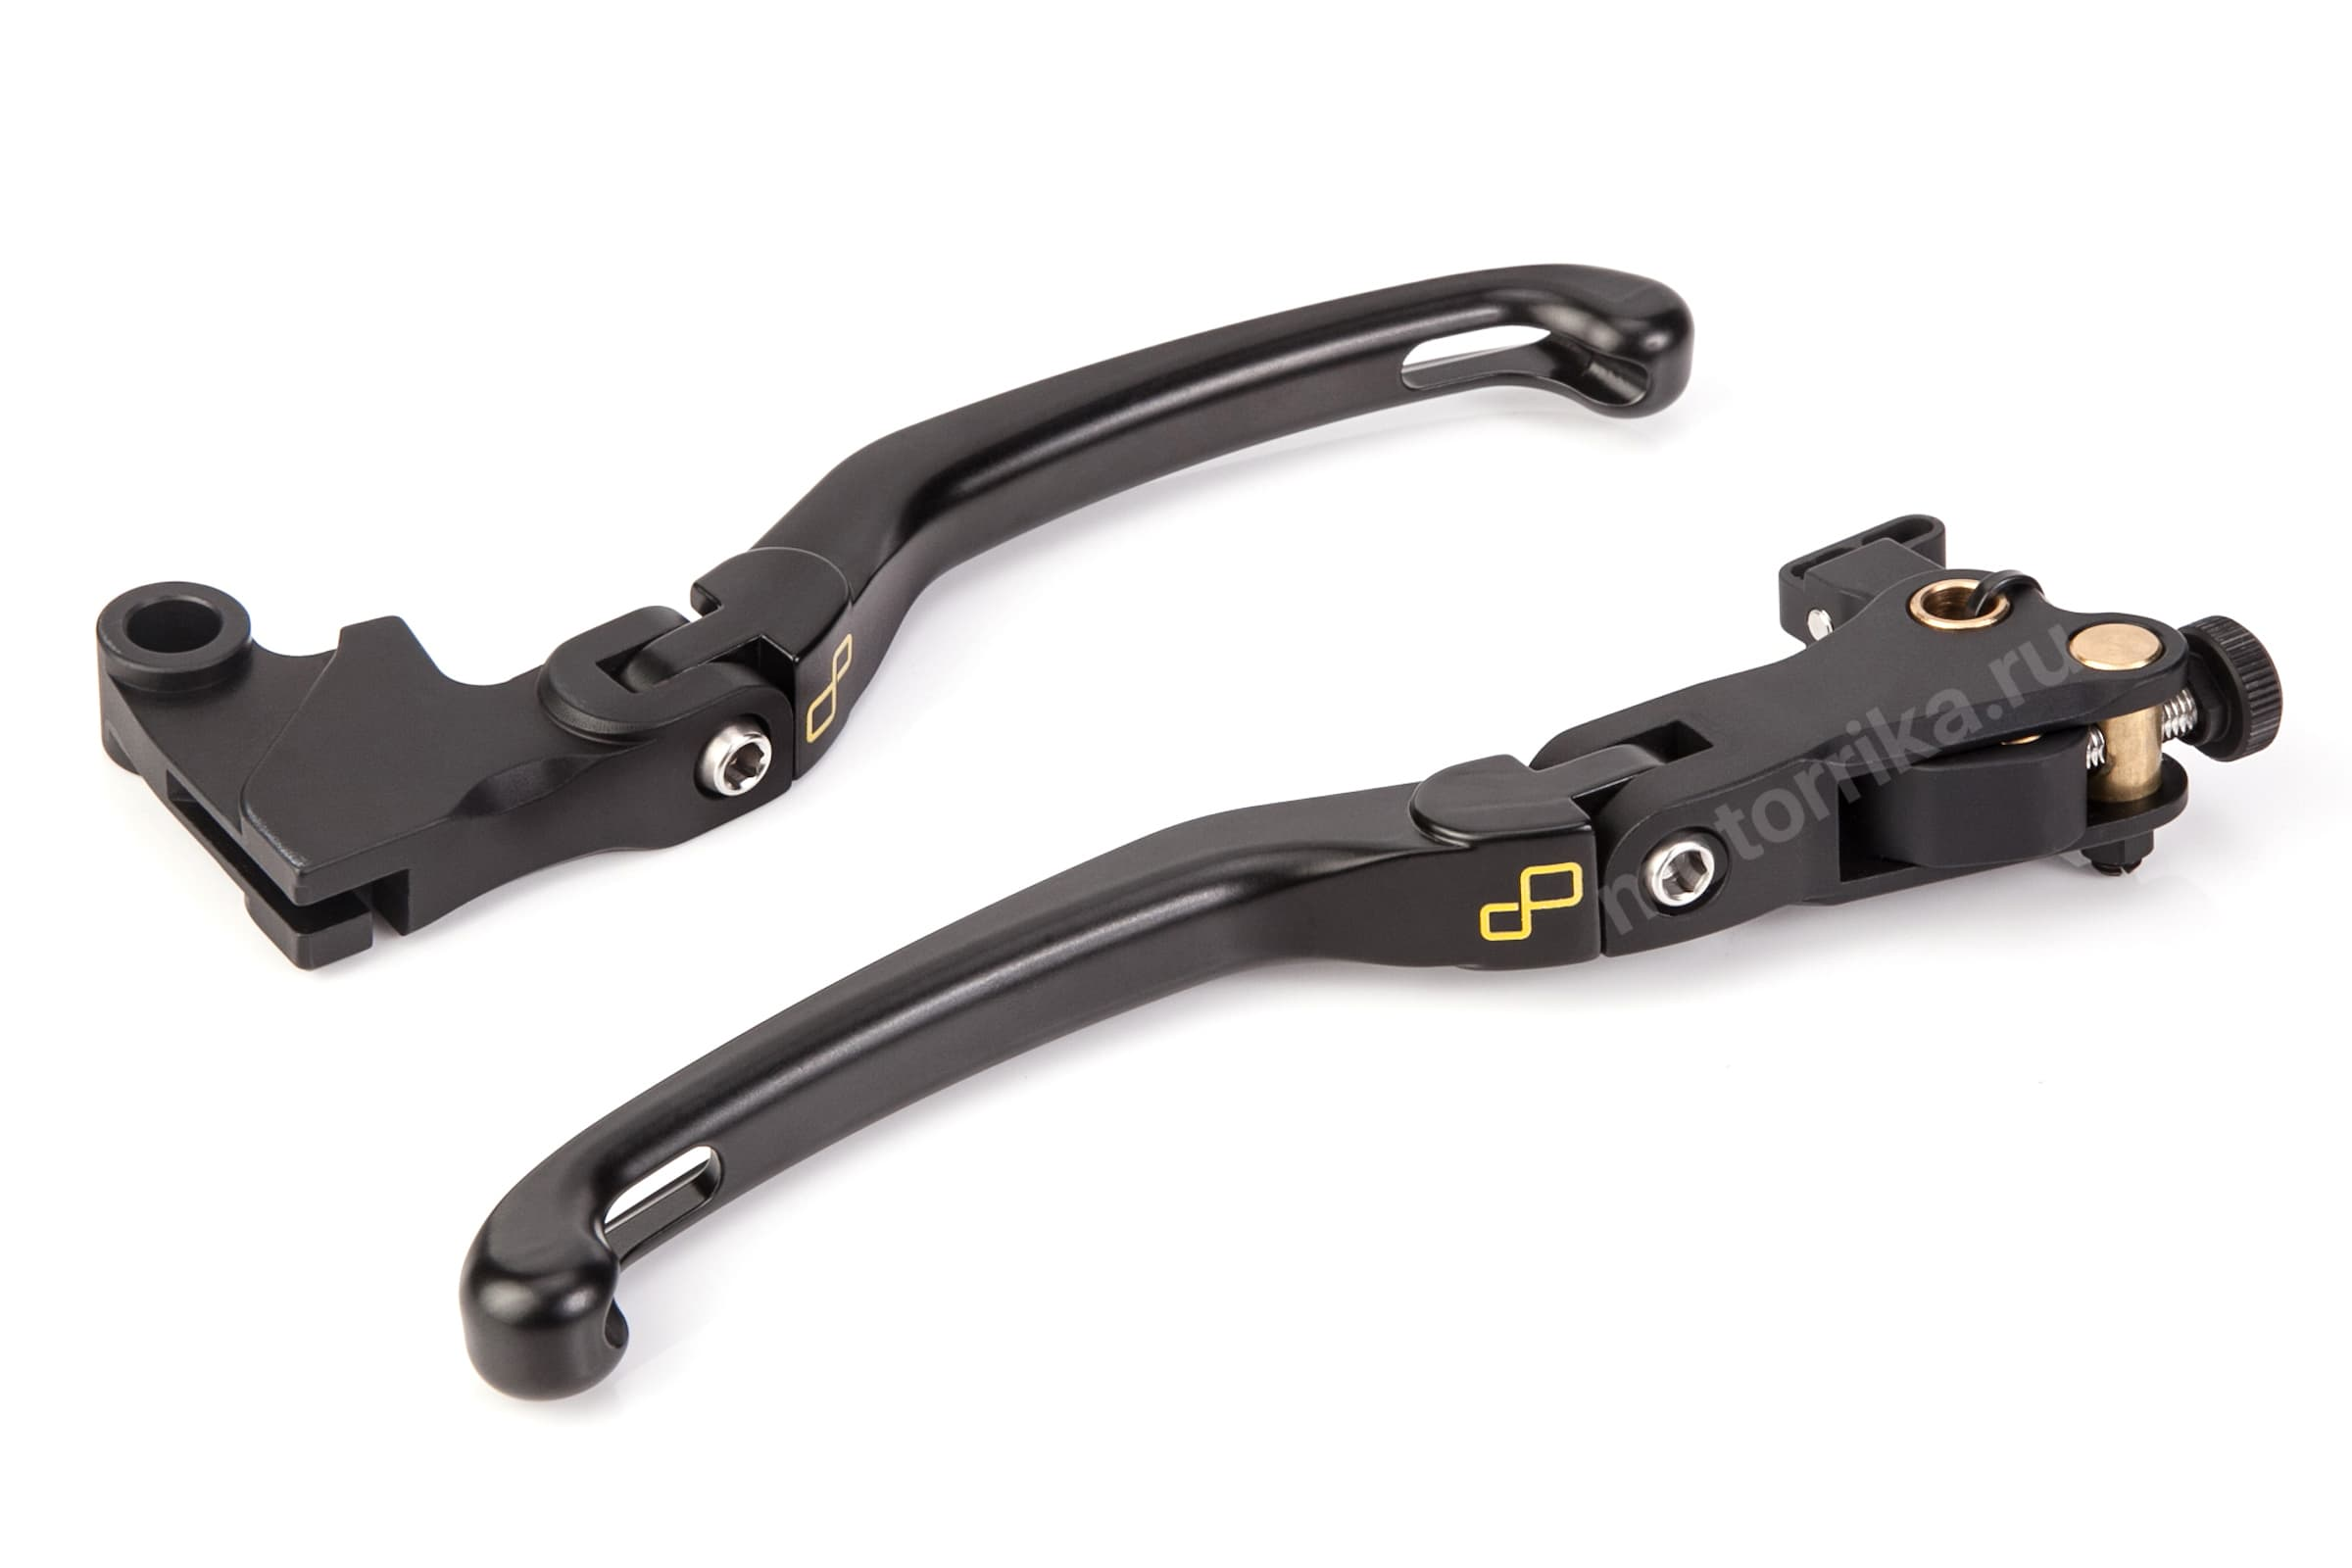 Комплект рычагов Lightech для Kawasaki Z750 10-12, Z1000 07-14, Z1000 SX 11-14, ZX-6R 05-14, ZX-10R 06-14, ZX-10R ABS 11-14